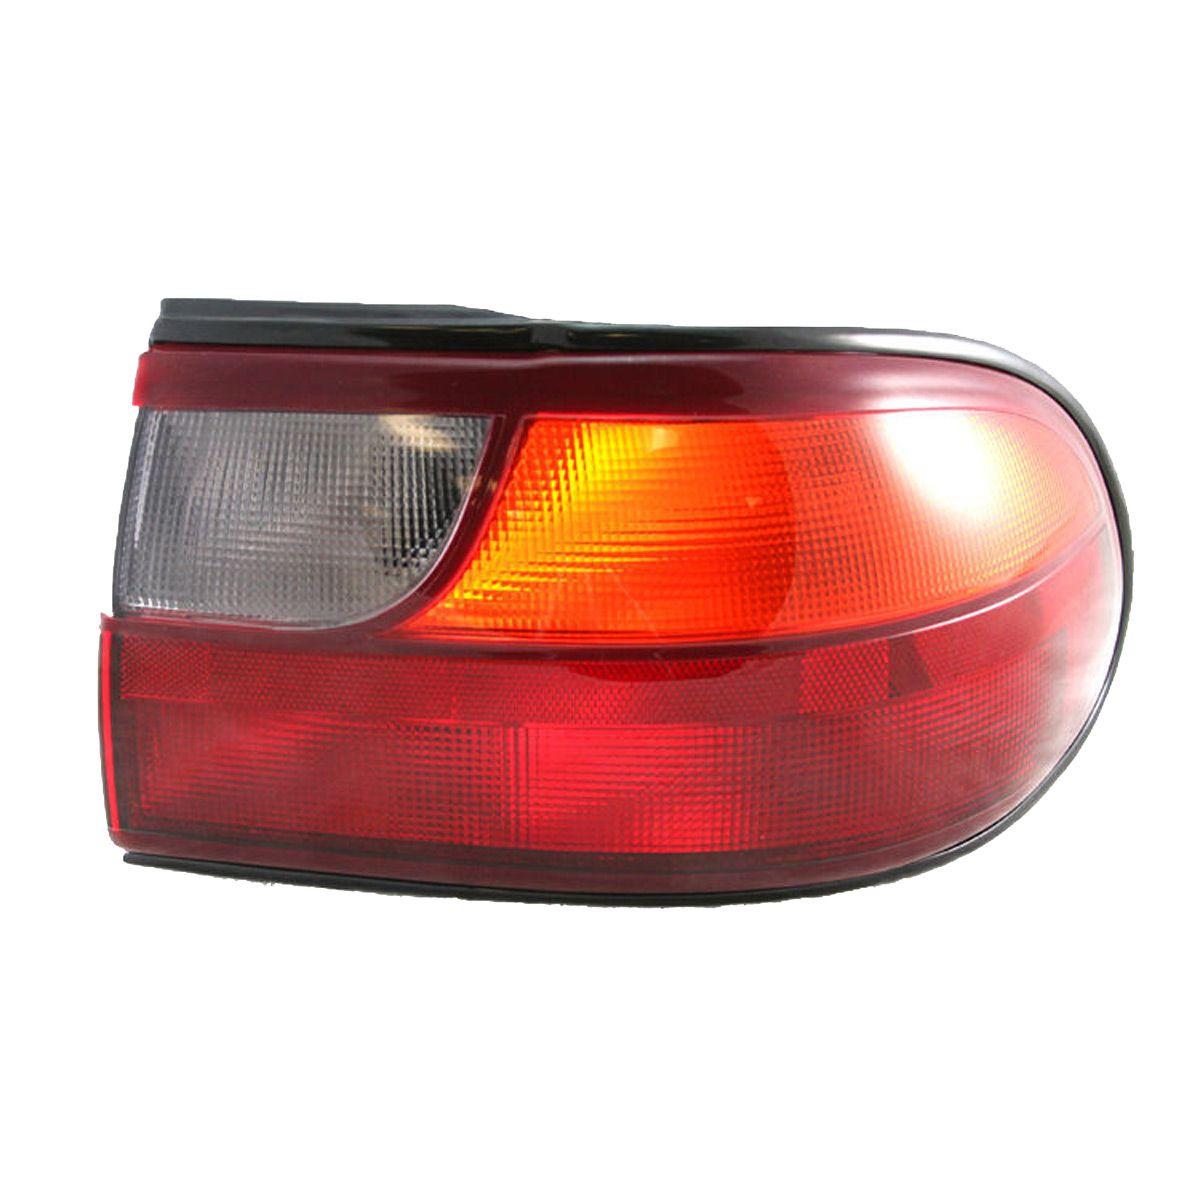 Taillight Taillamp Rear Brake Light Driver Side Left LH for 97-05 Malibu